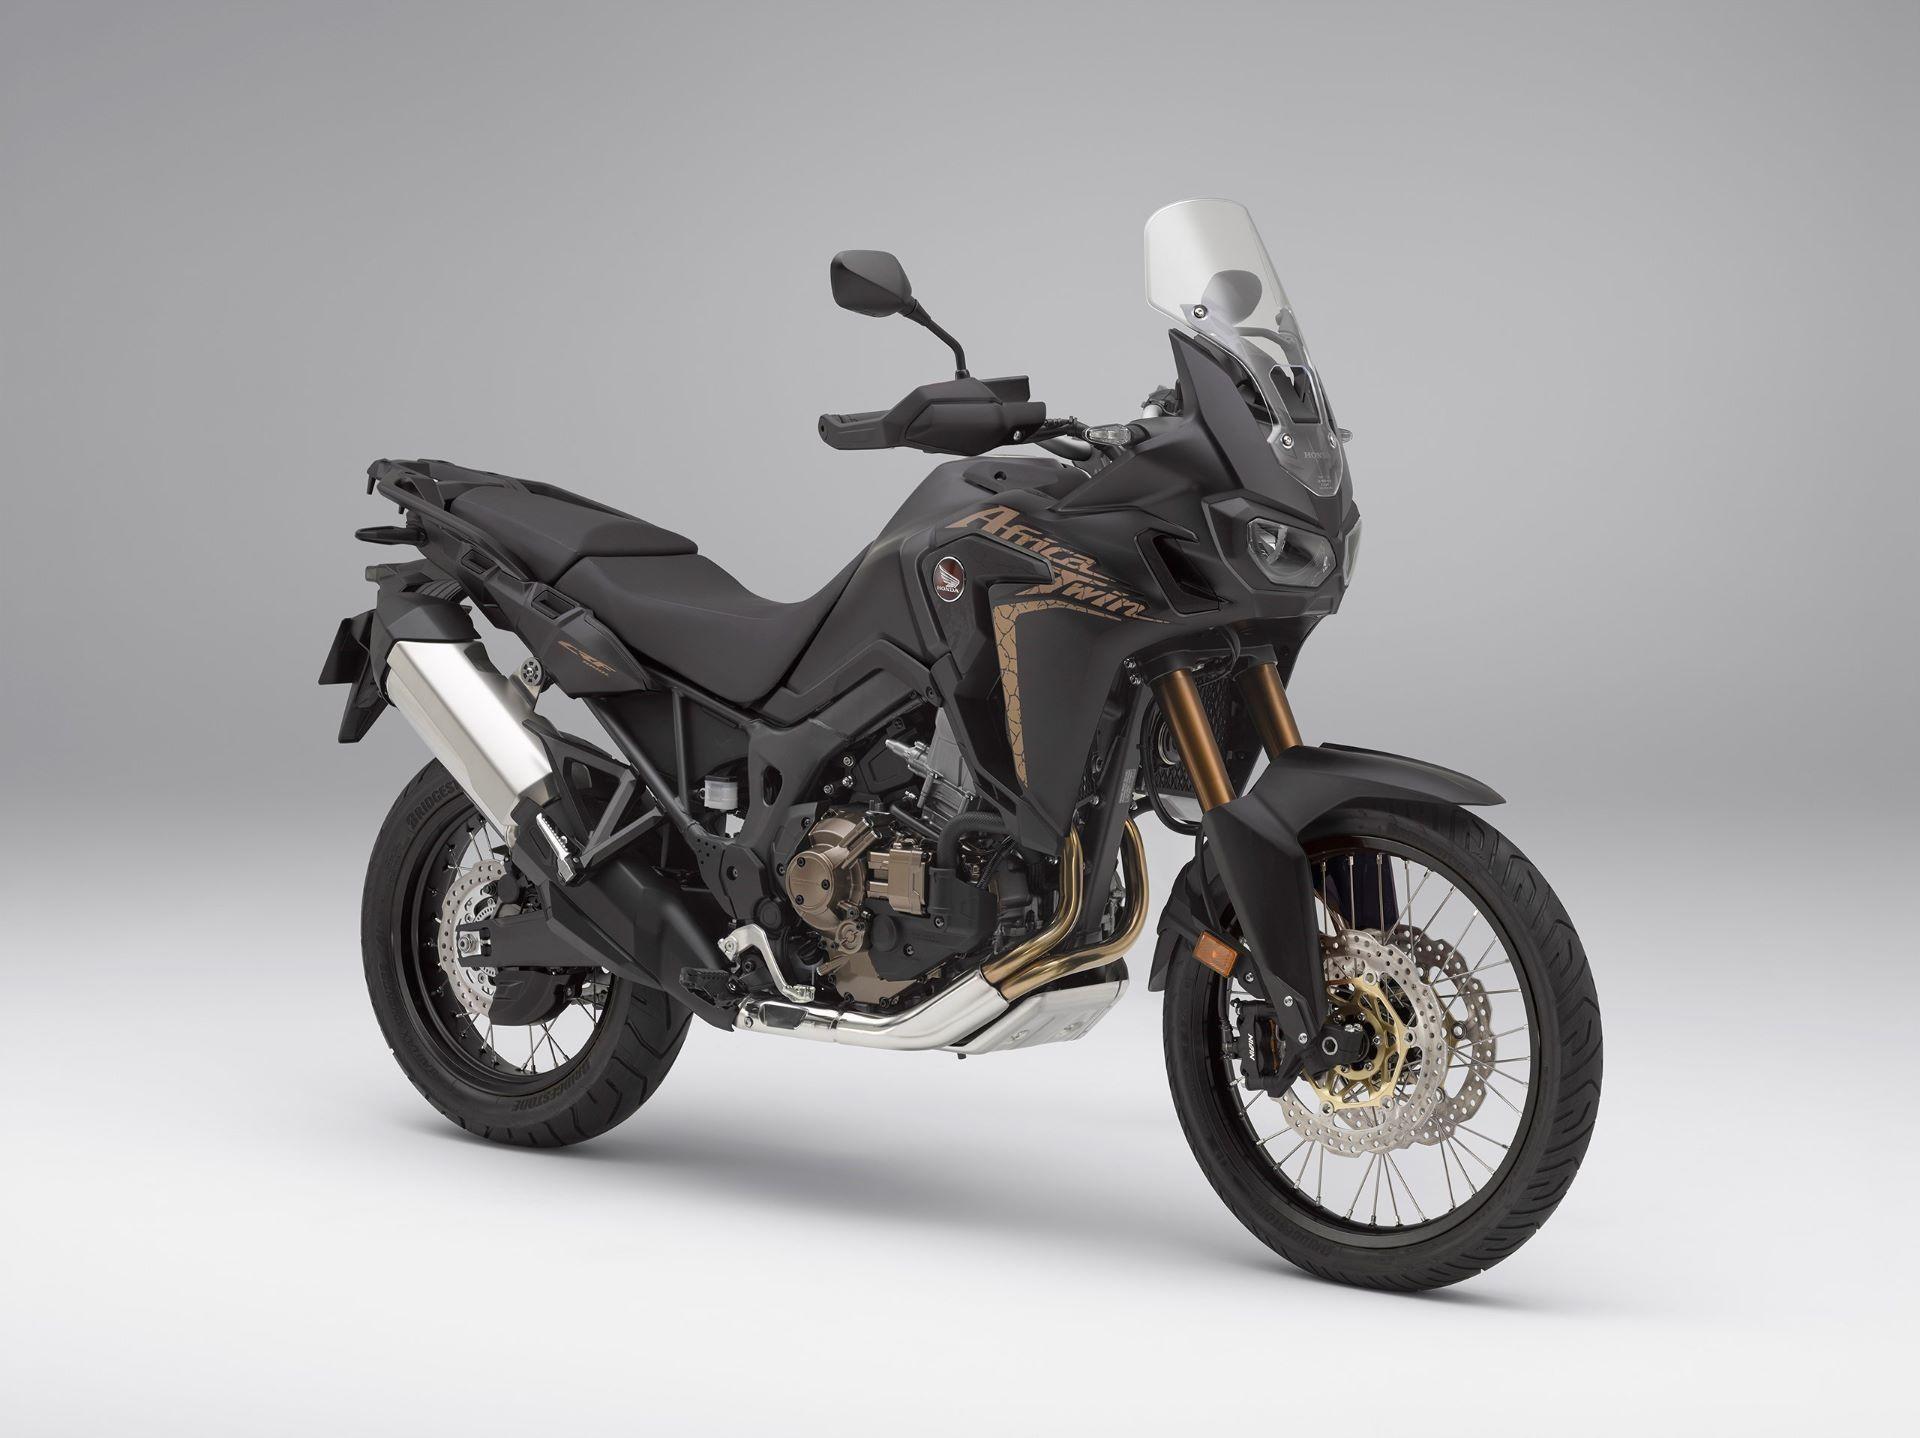 moto neuve acheter honda crf 1000 a africa twin 2018 motodesign ag pratteln. Black Bedroom Furniture Sets. Home Design Ideas